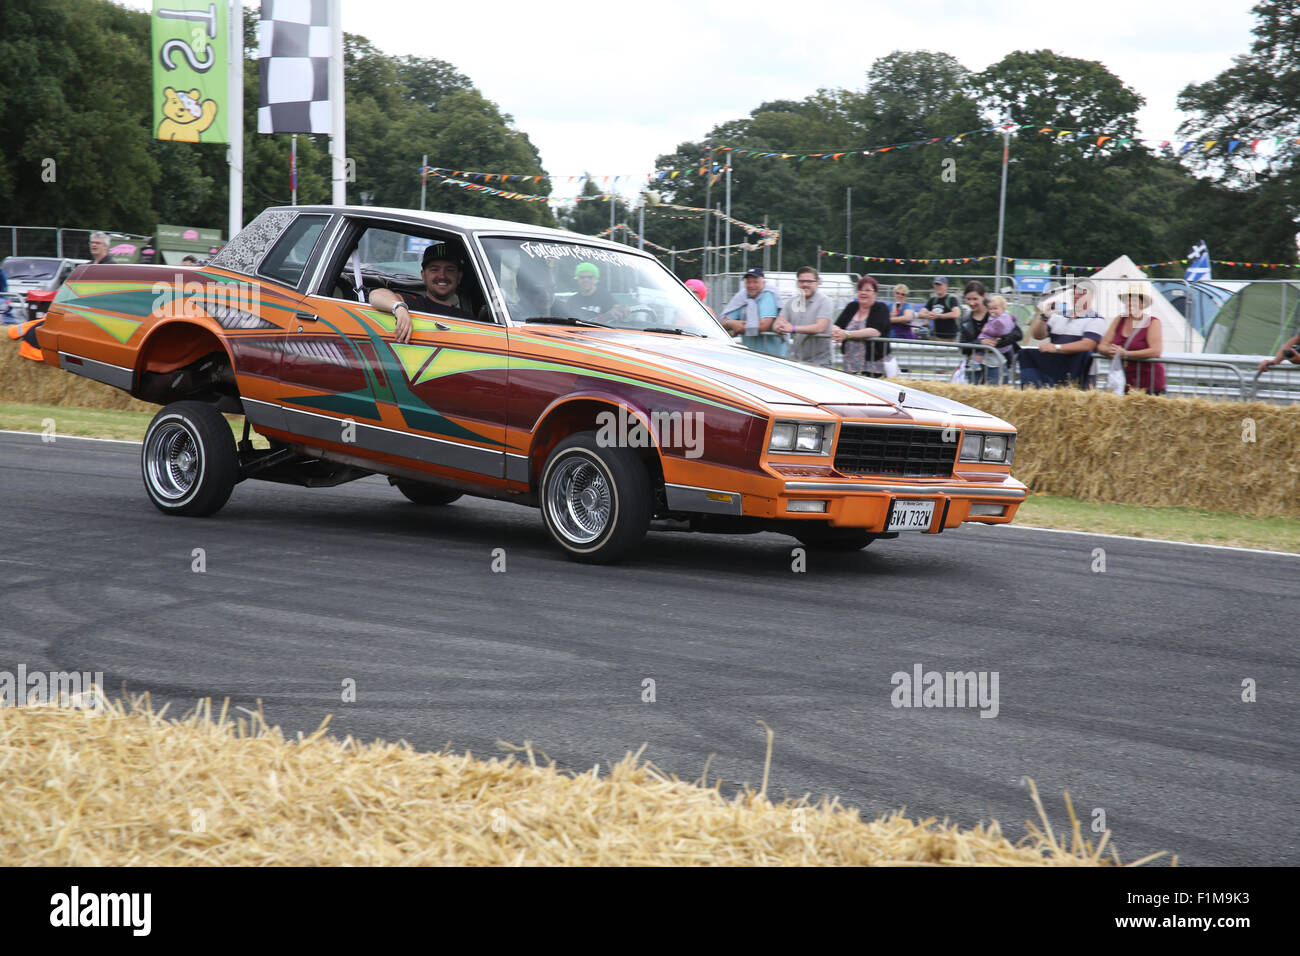 1981 Chevrolet Monte Carlo Street Car Car Fest North 2015 Stock